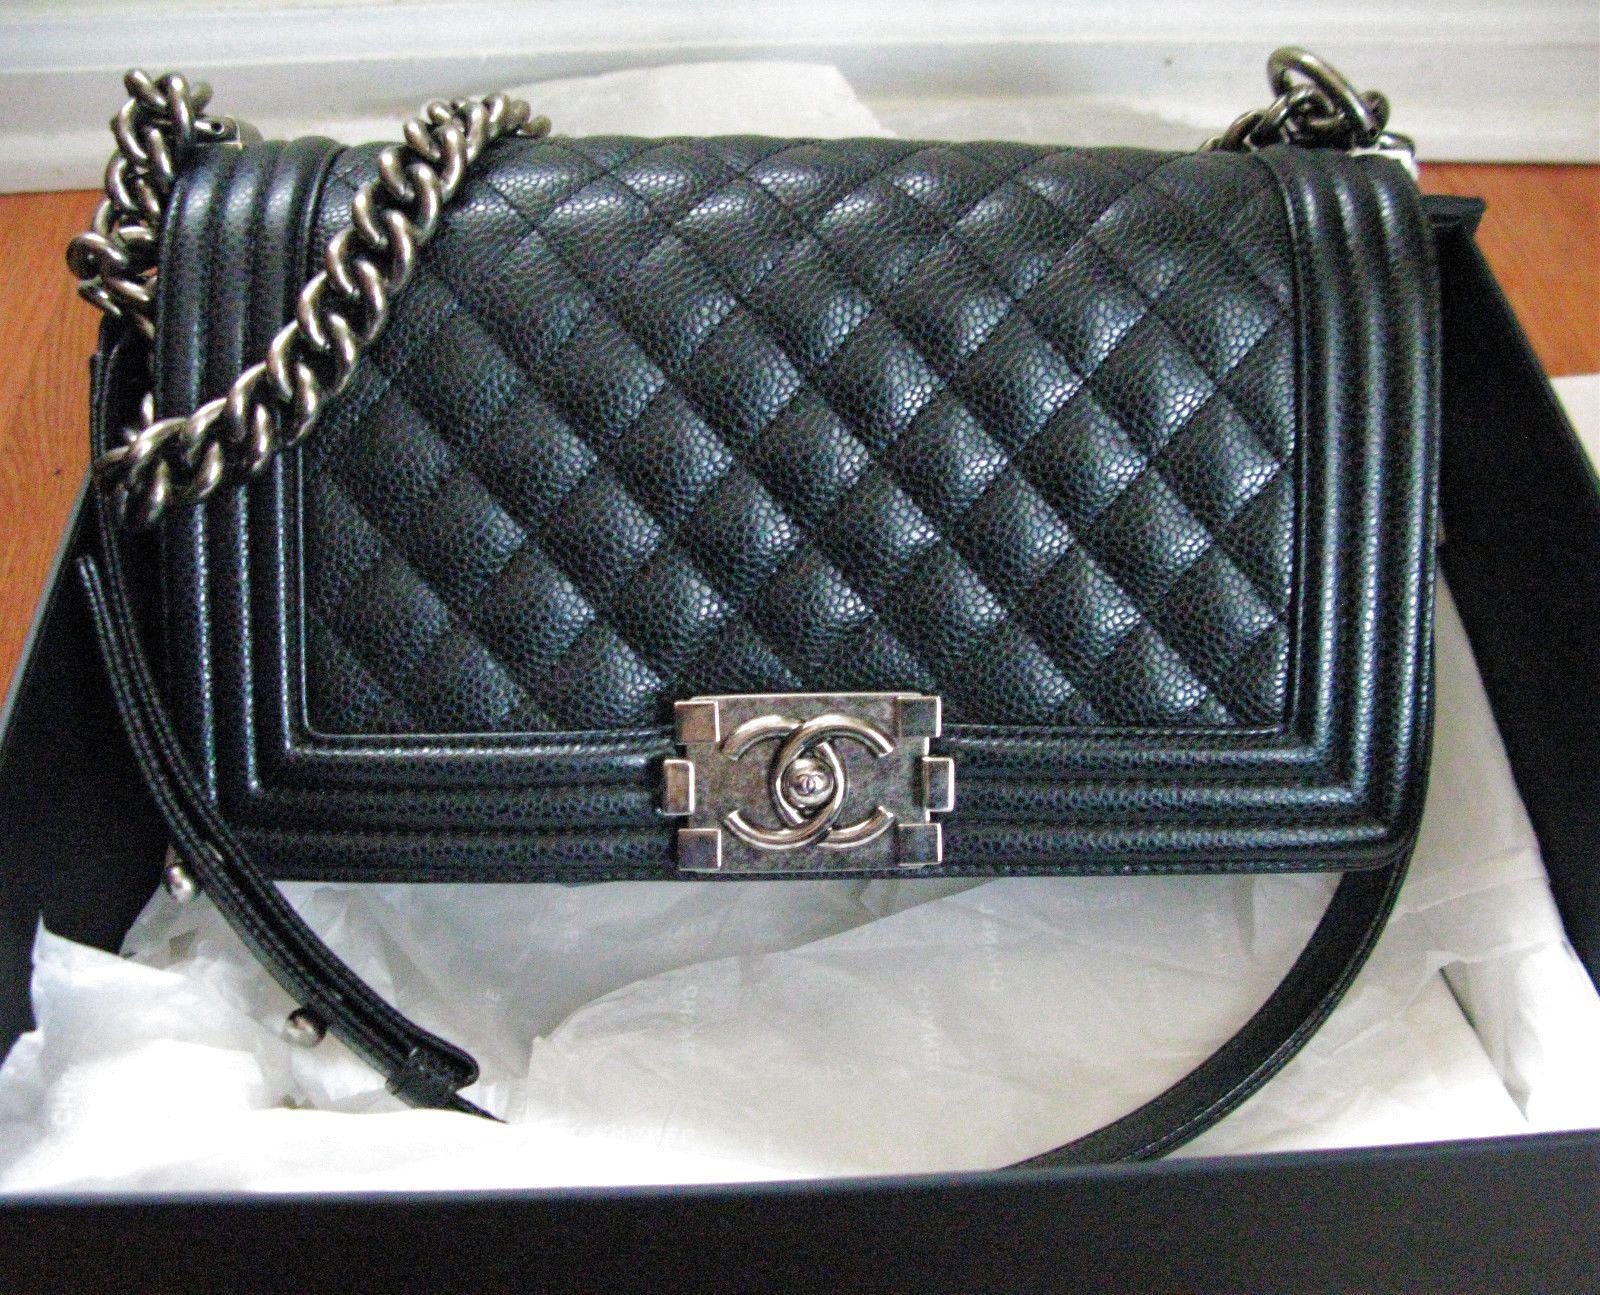 mint authentic chanel le boy bag black caviar dark silver hardware old medium 45990 chanel handbags pinterest boys medium and silver